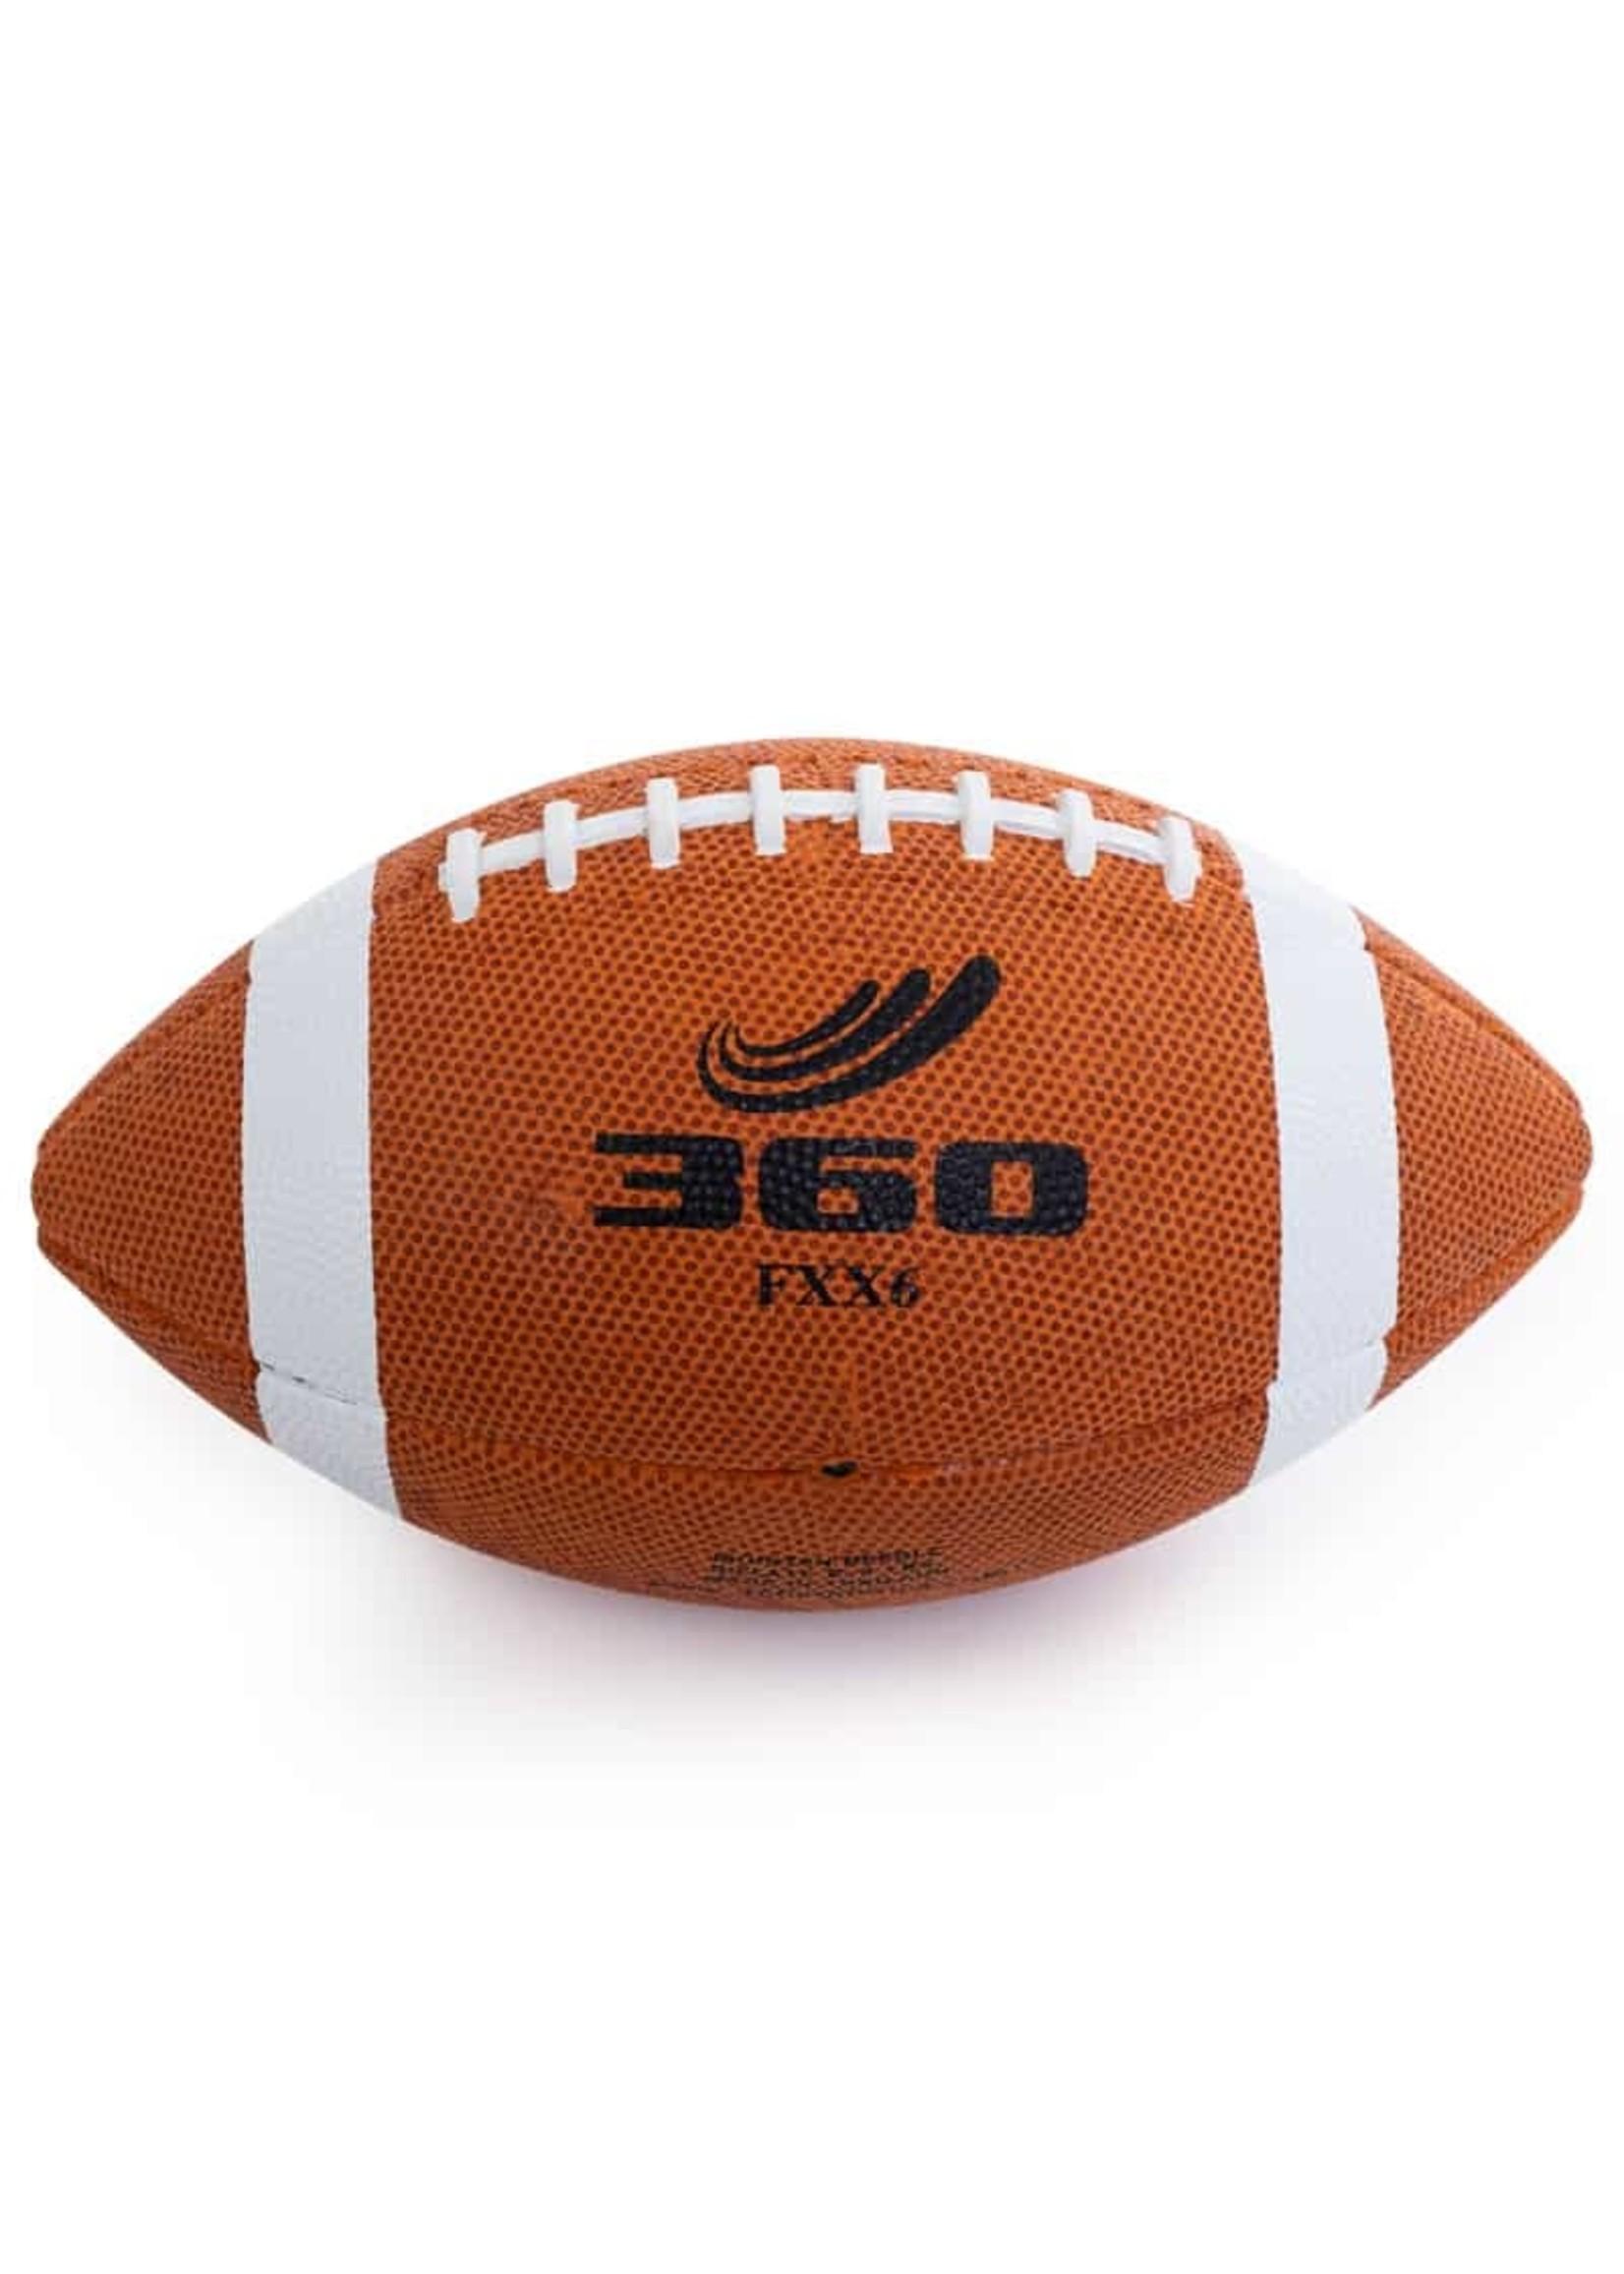 360 ATHLETICS 360 FOOTBALL CELLULAR COMPOSITE